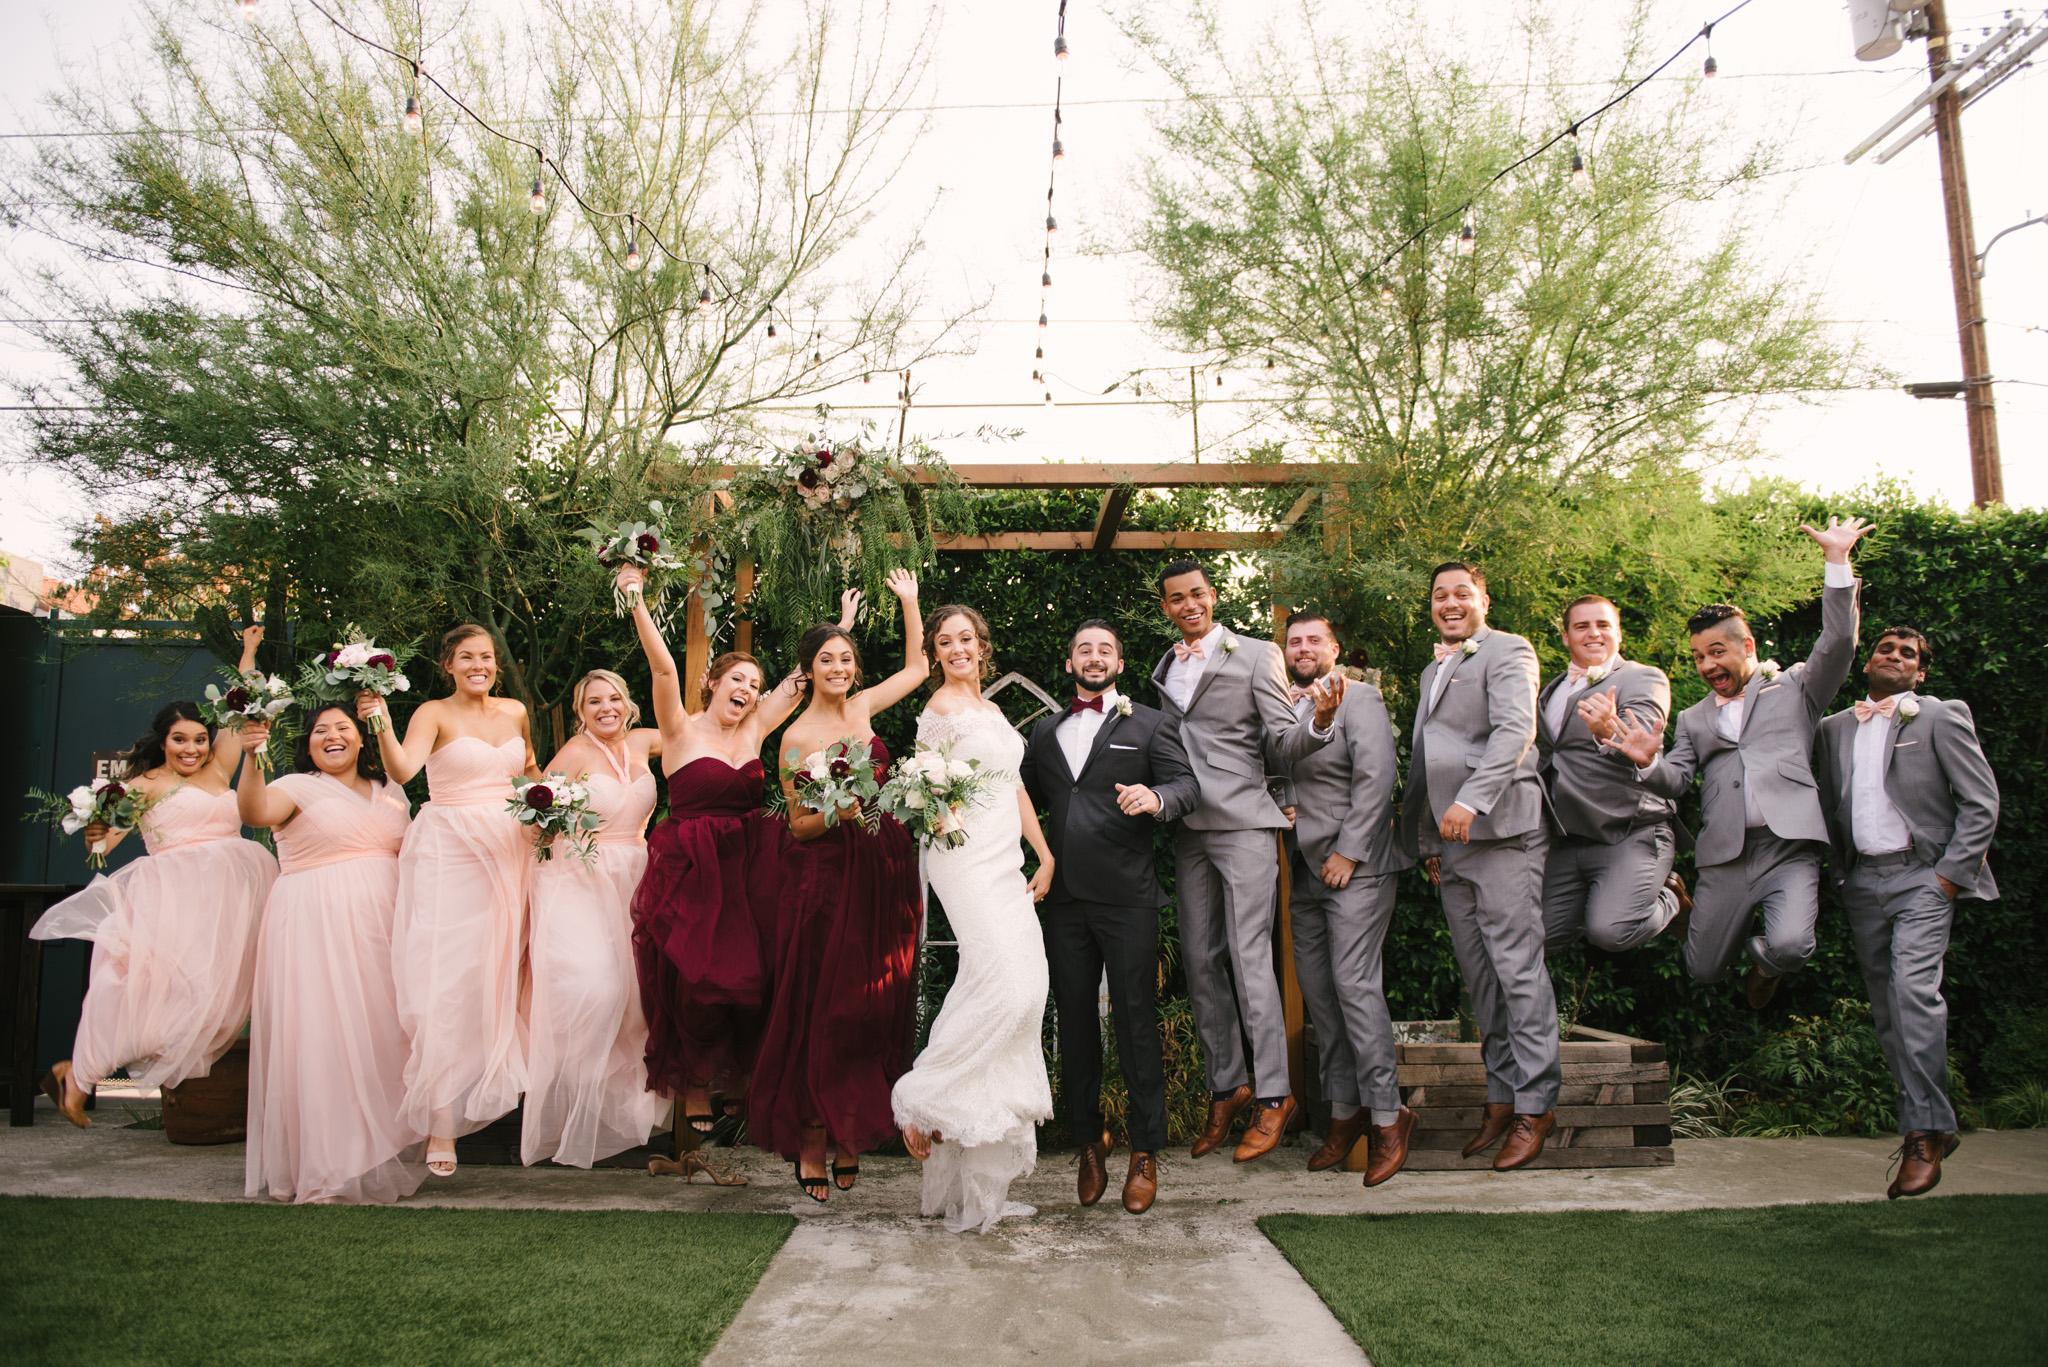 LJ-Ruby-Street-Los-Angeles-County-Wedding-Photography-8